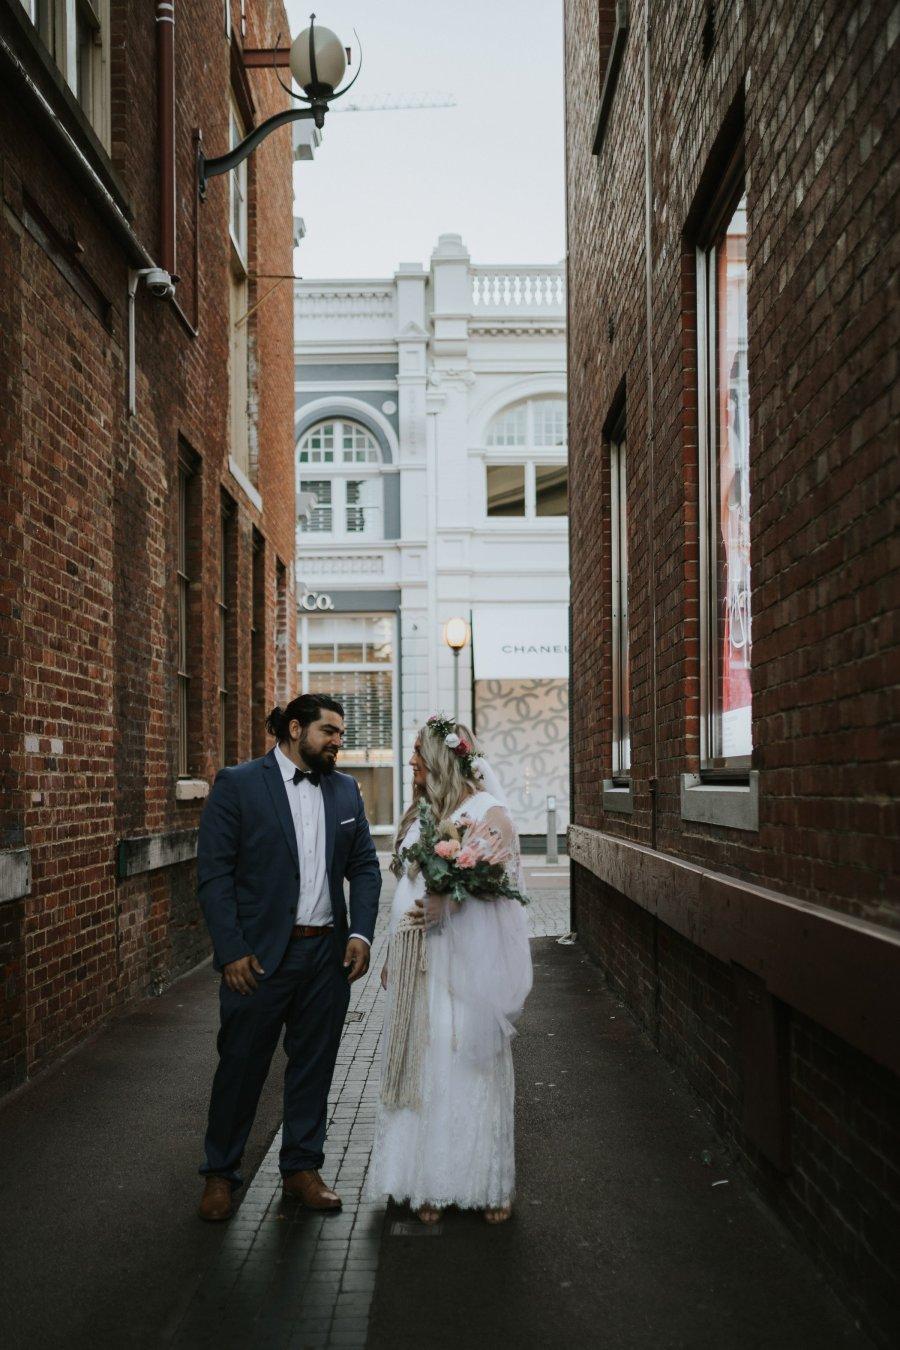 Ebony Blush Photography   Perth wedding Photographer   Perth City Farm Wedding   Imogen + Tristian122